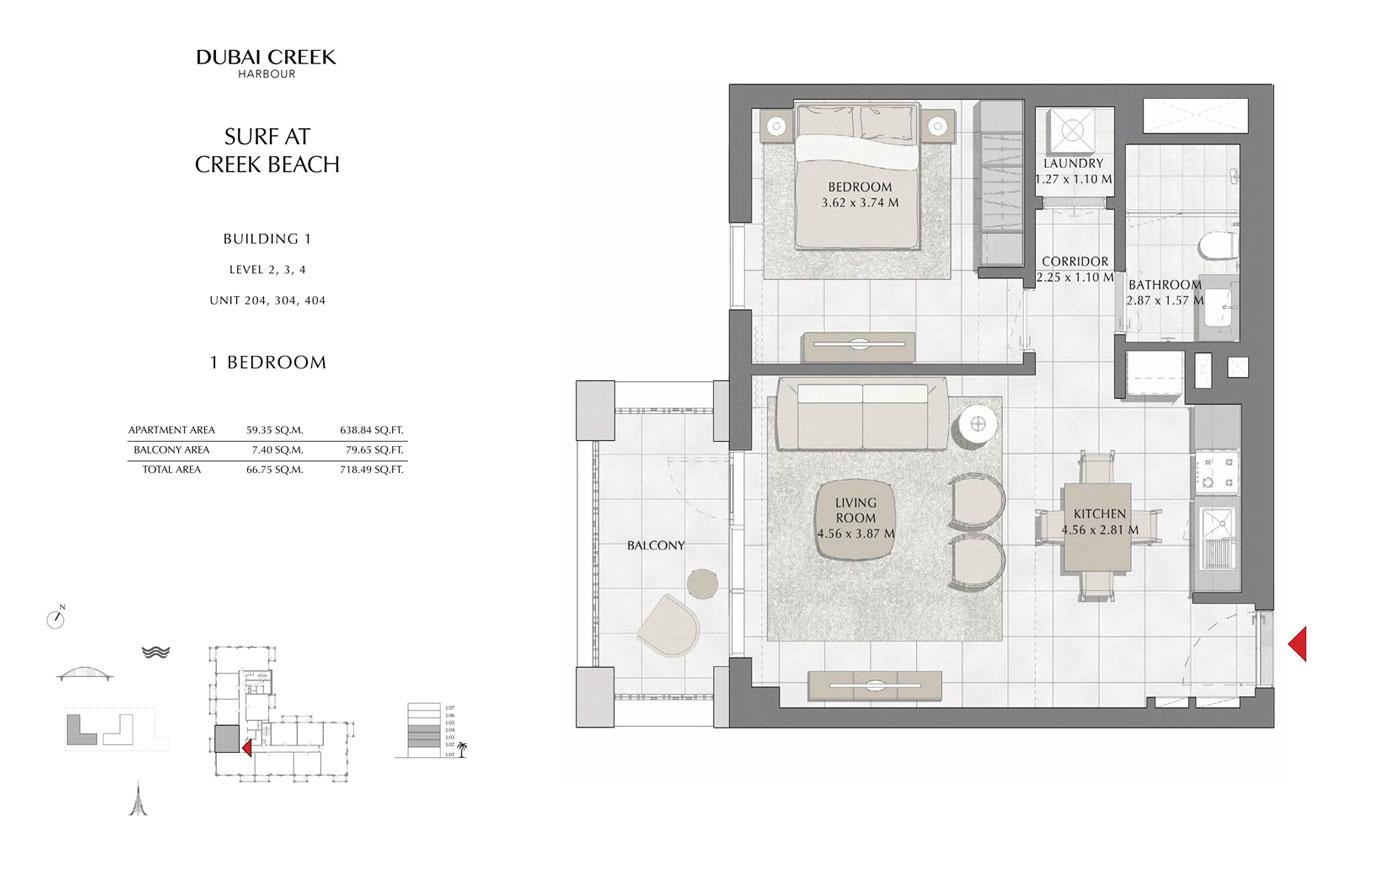 Building-1-1-Bedroom,-Level-2-3-4,-Unit-204-304-404,-Size-718.49-sq-ft